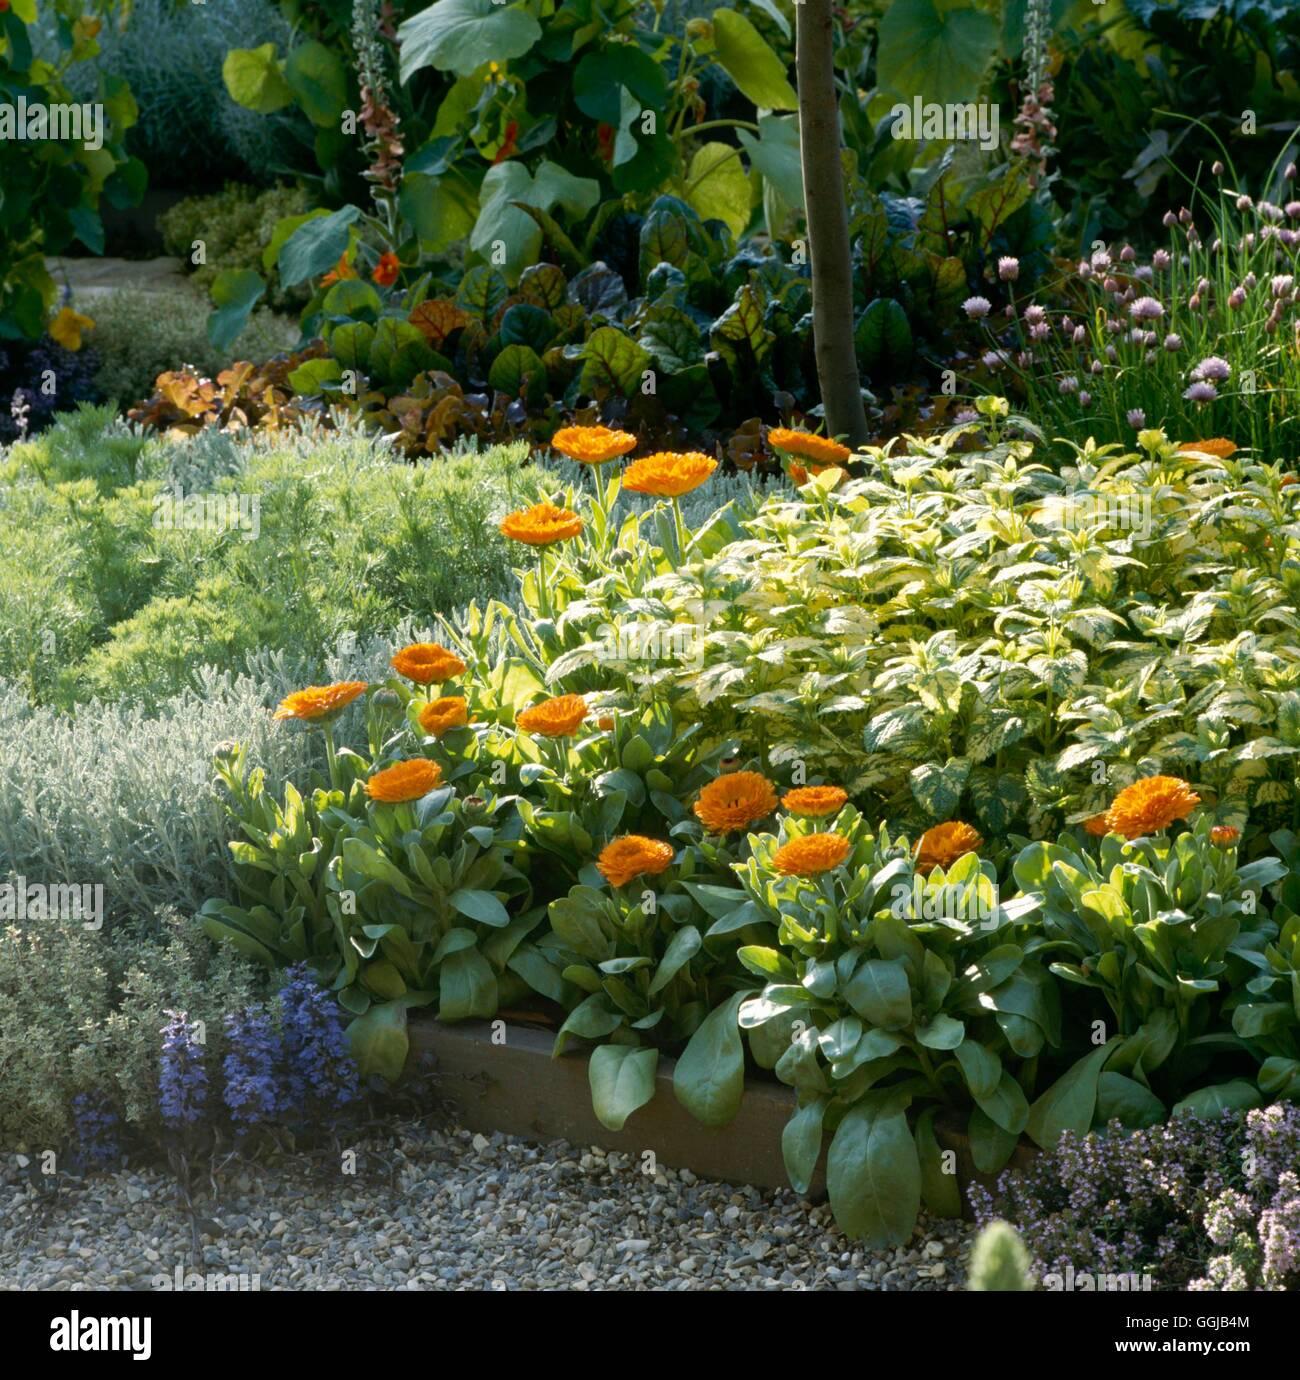 Planting Marigolds In Herb Garden Garden Ftempo Math Wallpaper Golden Find Free HD for Desktop [pastnedes.tk]